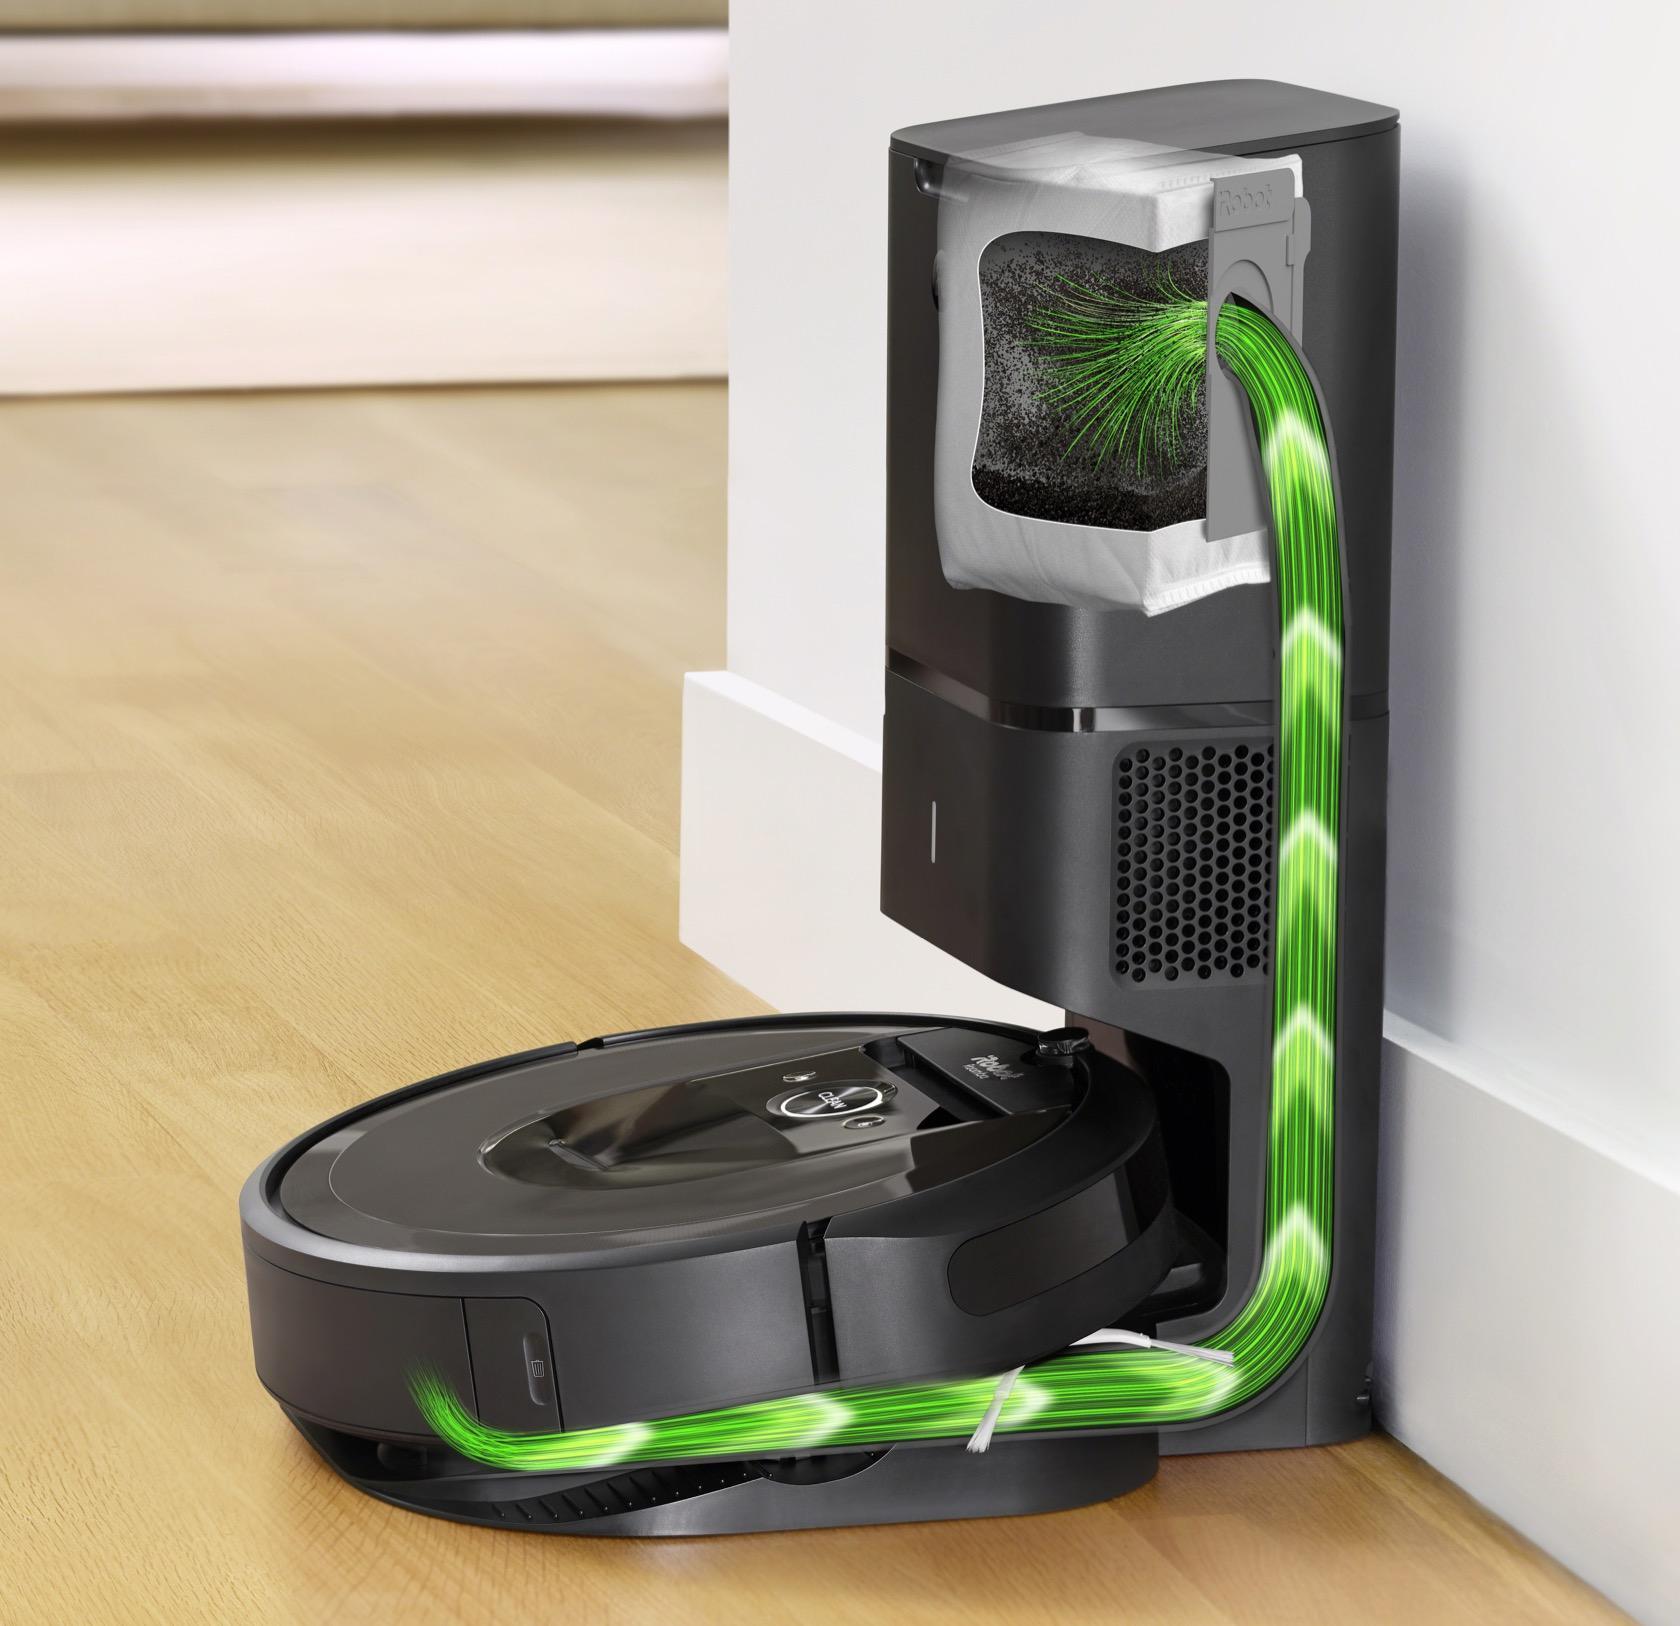 Irobot S Self Emptying Roomba I7 Fixes Robot Vacuums Big